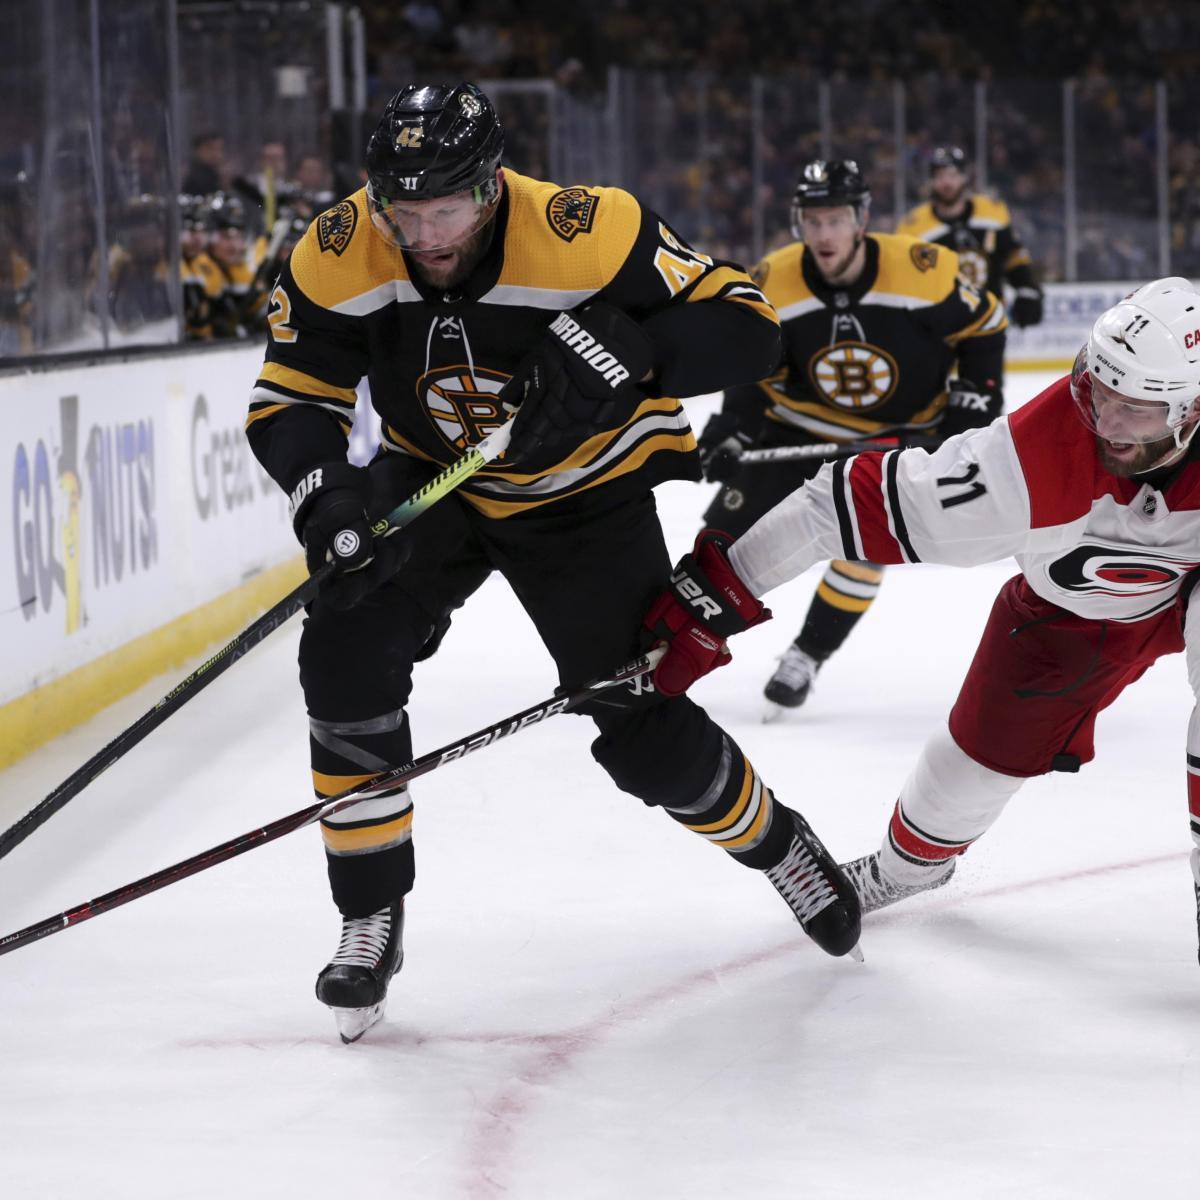 NHL Playoff Bracket 2019: Known Schedule Details For